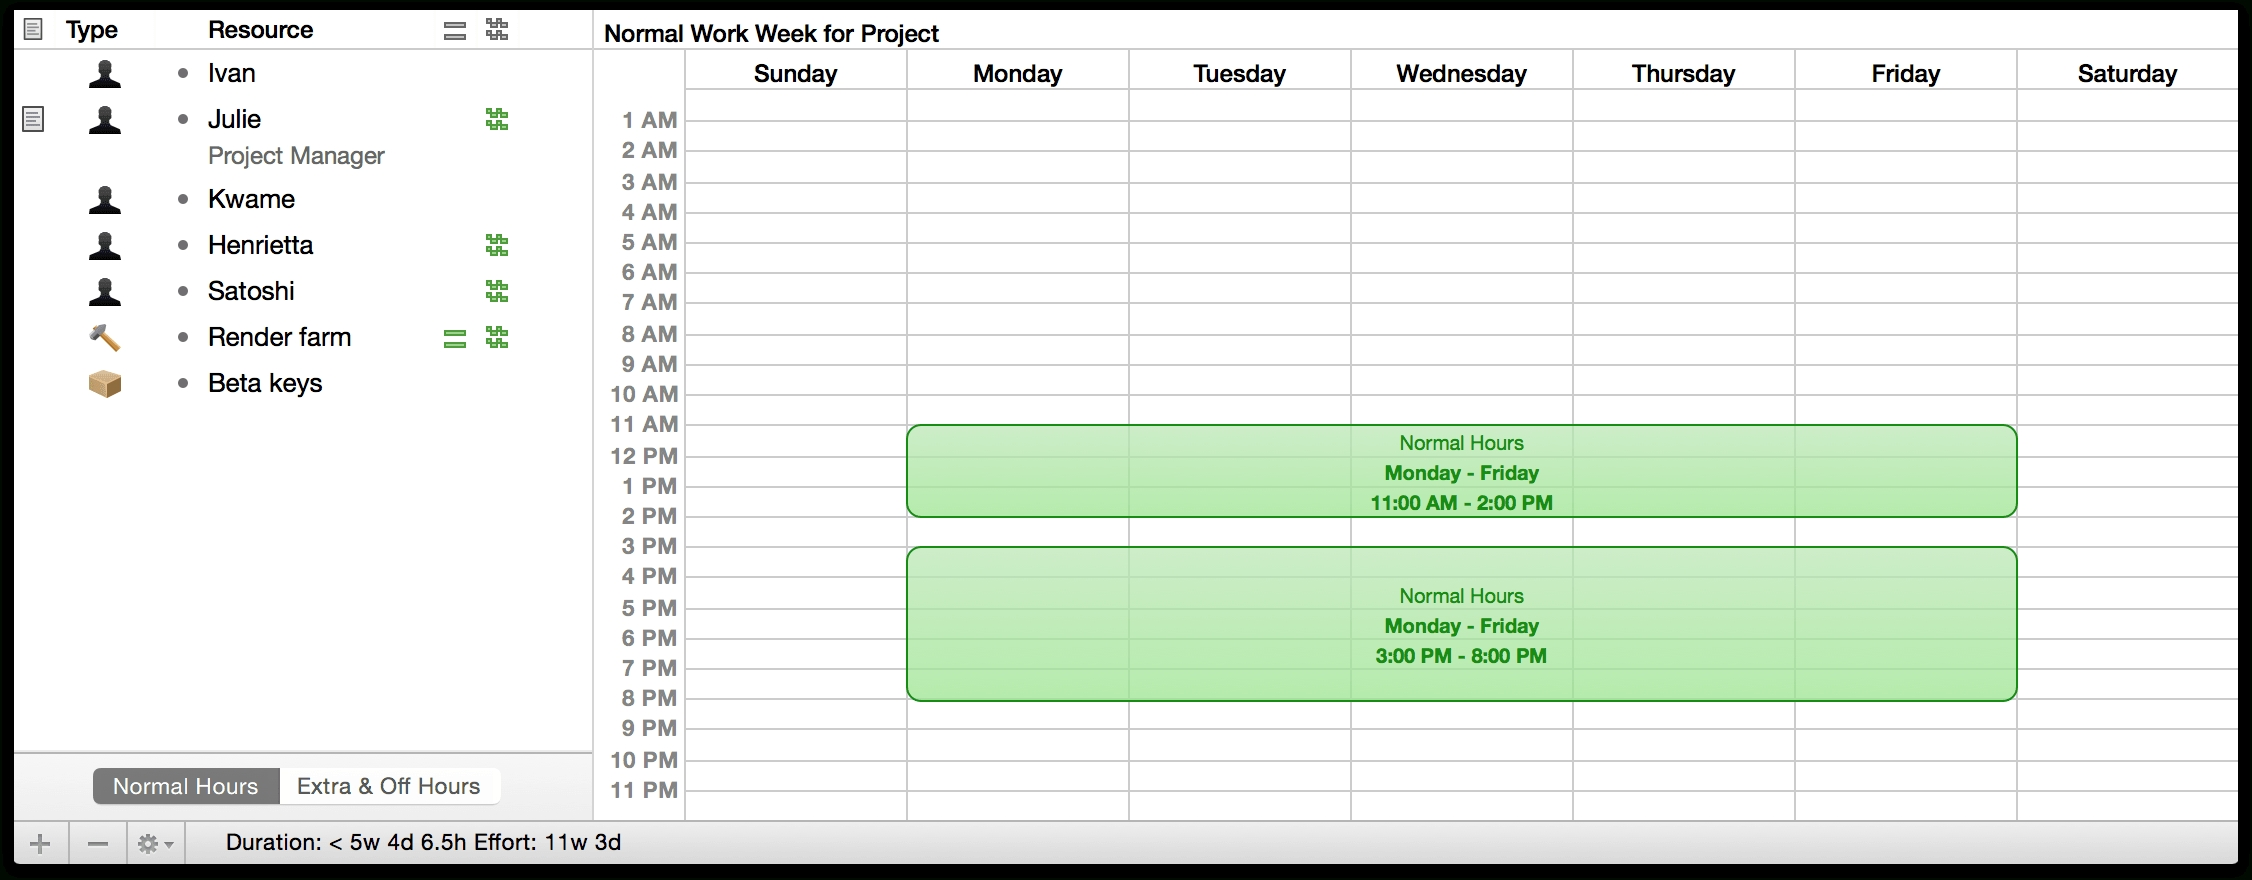 Omniplan 2 For Mac User Manual - Using The Calendar